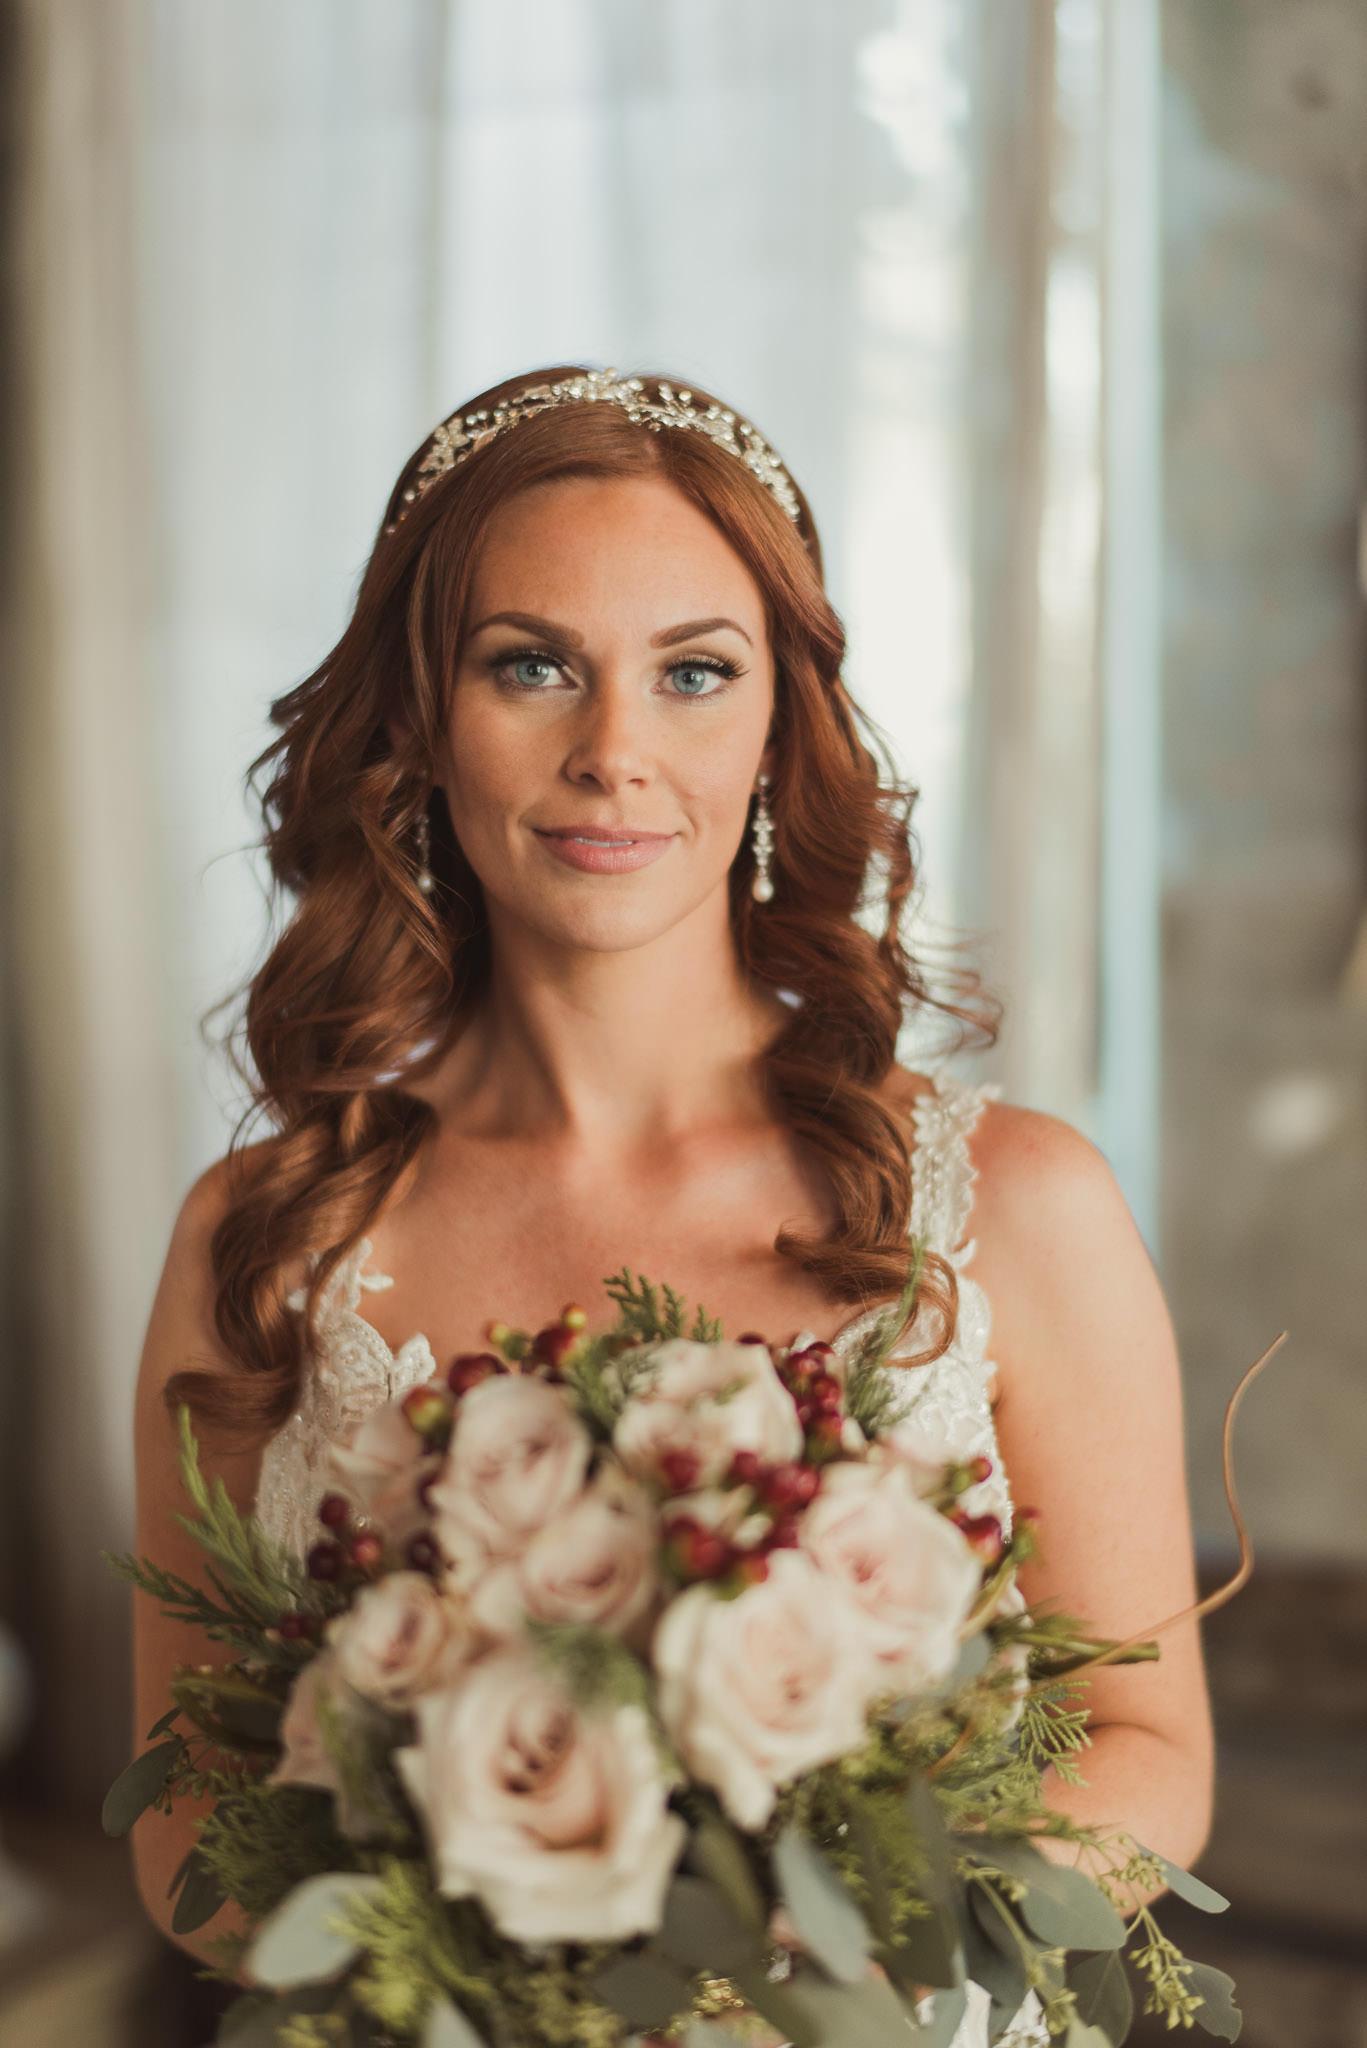 Cynthia-Curtis-Olde-Dobbine-Station-Houston-Wedding-Photographer-sm-42.jpg